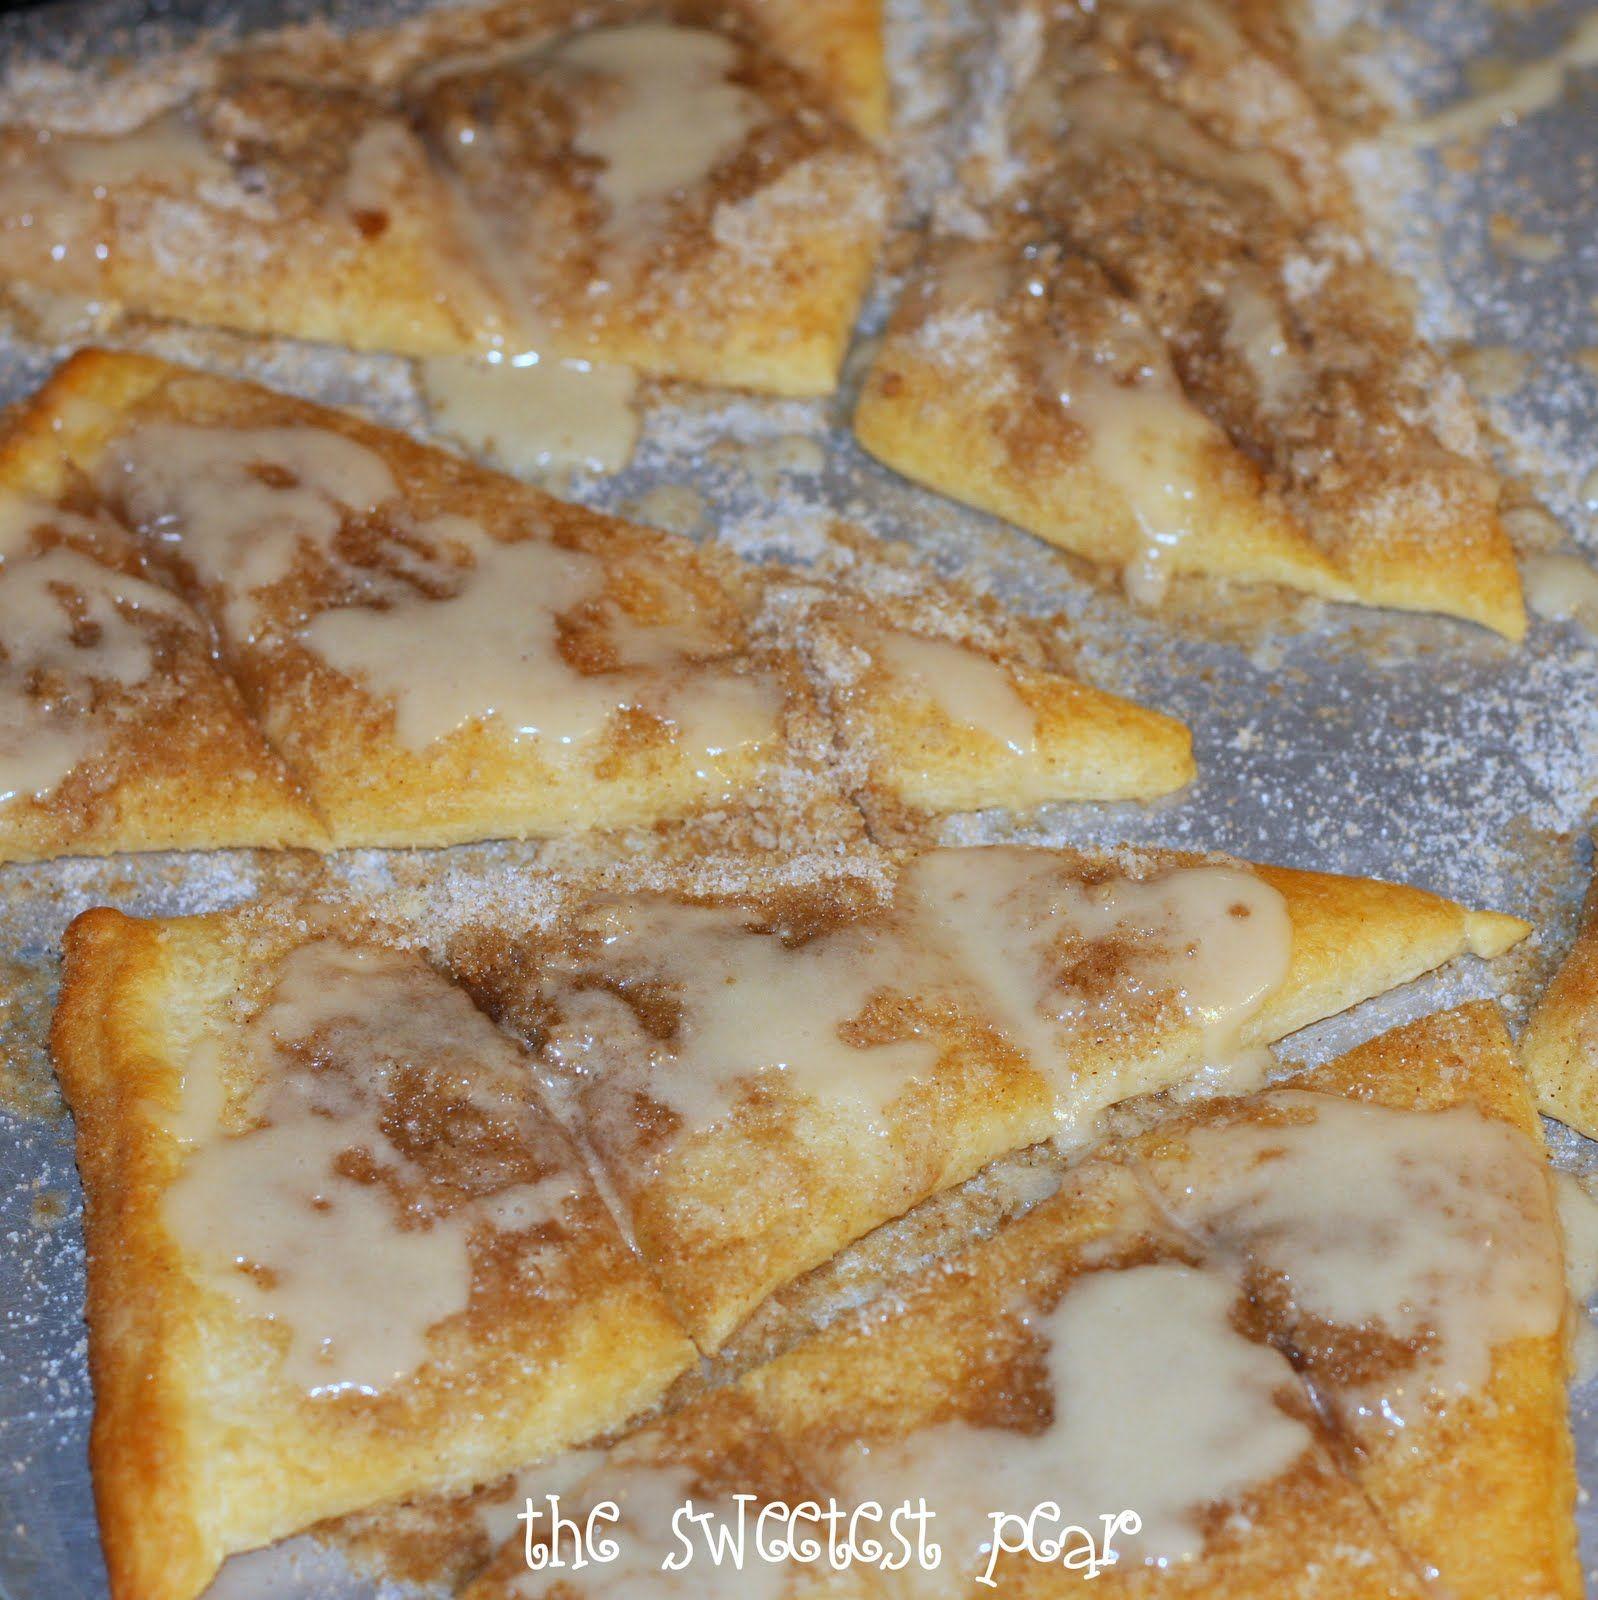 Cinnamon-Sugar Pizza made with crescent rolls